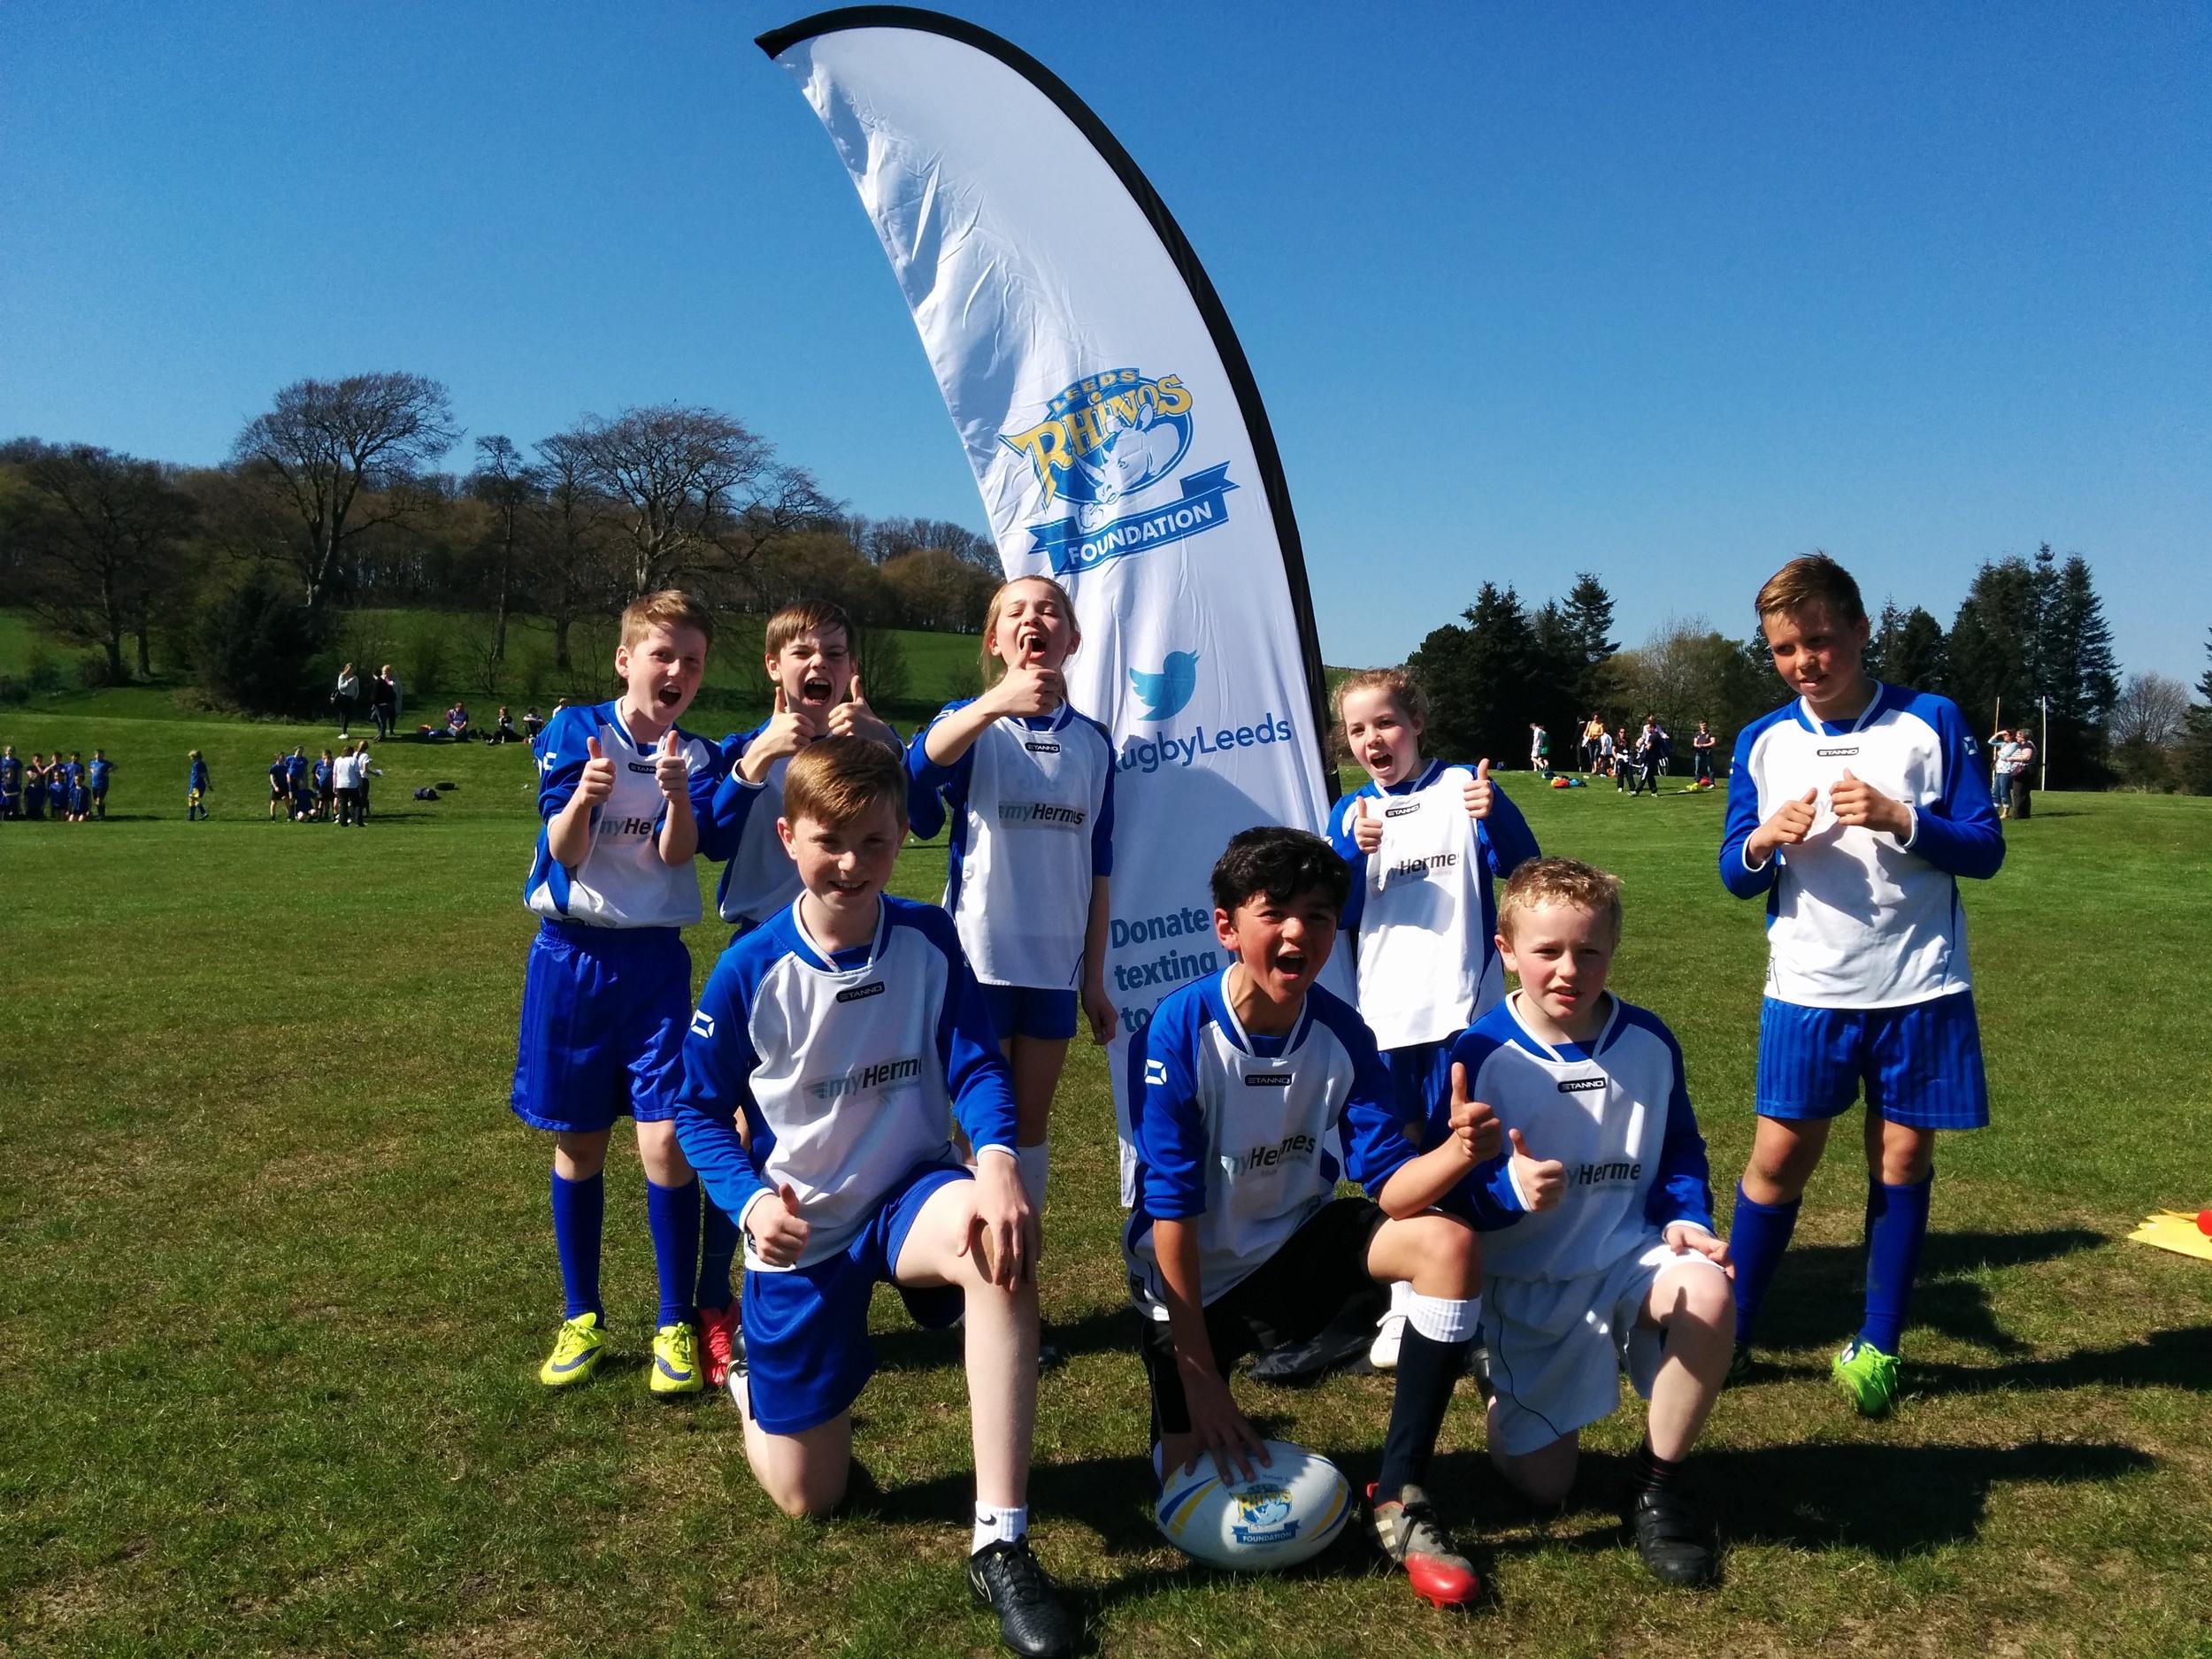 St Mary's, Horsforth Winning Team!